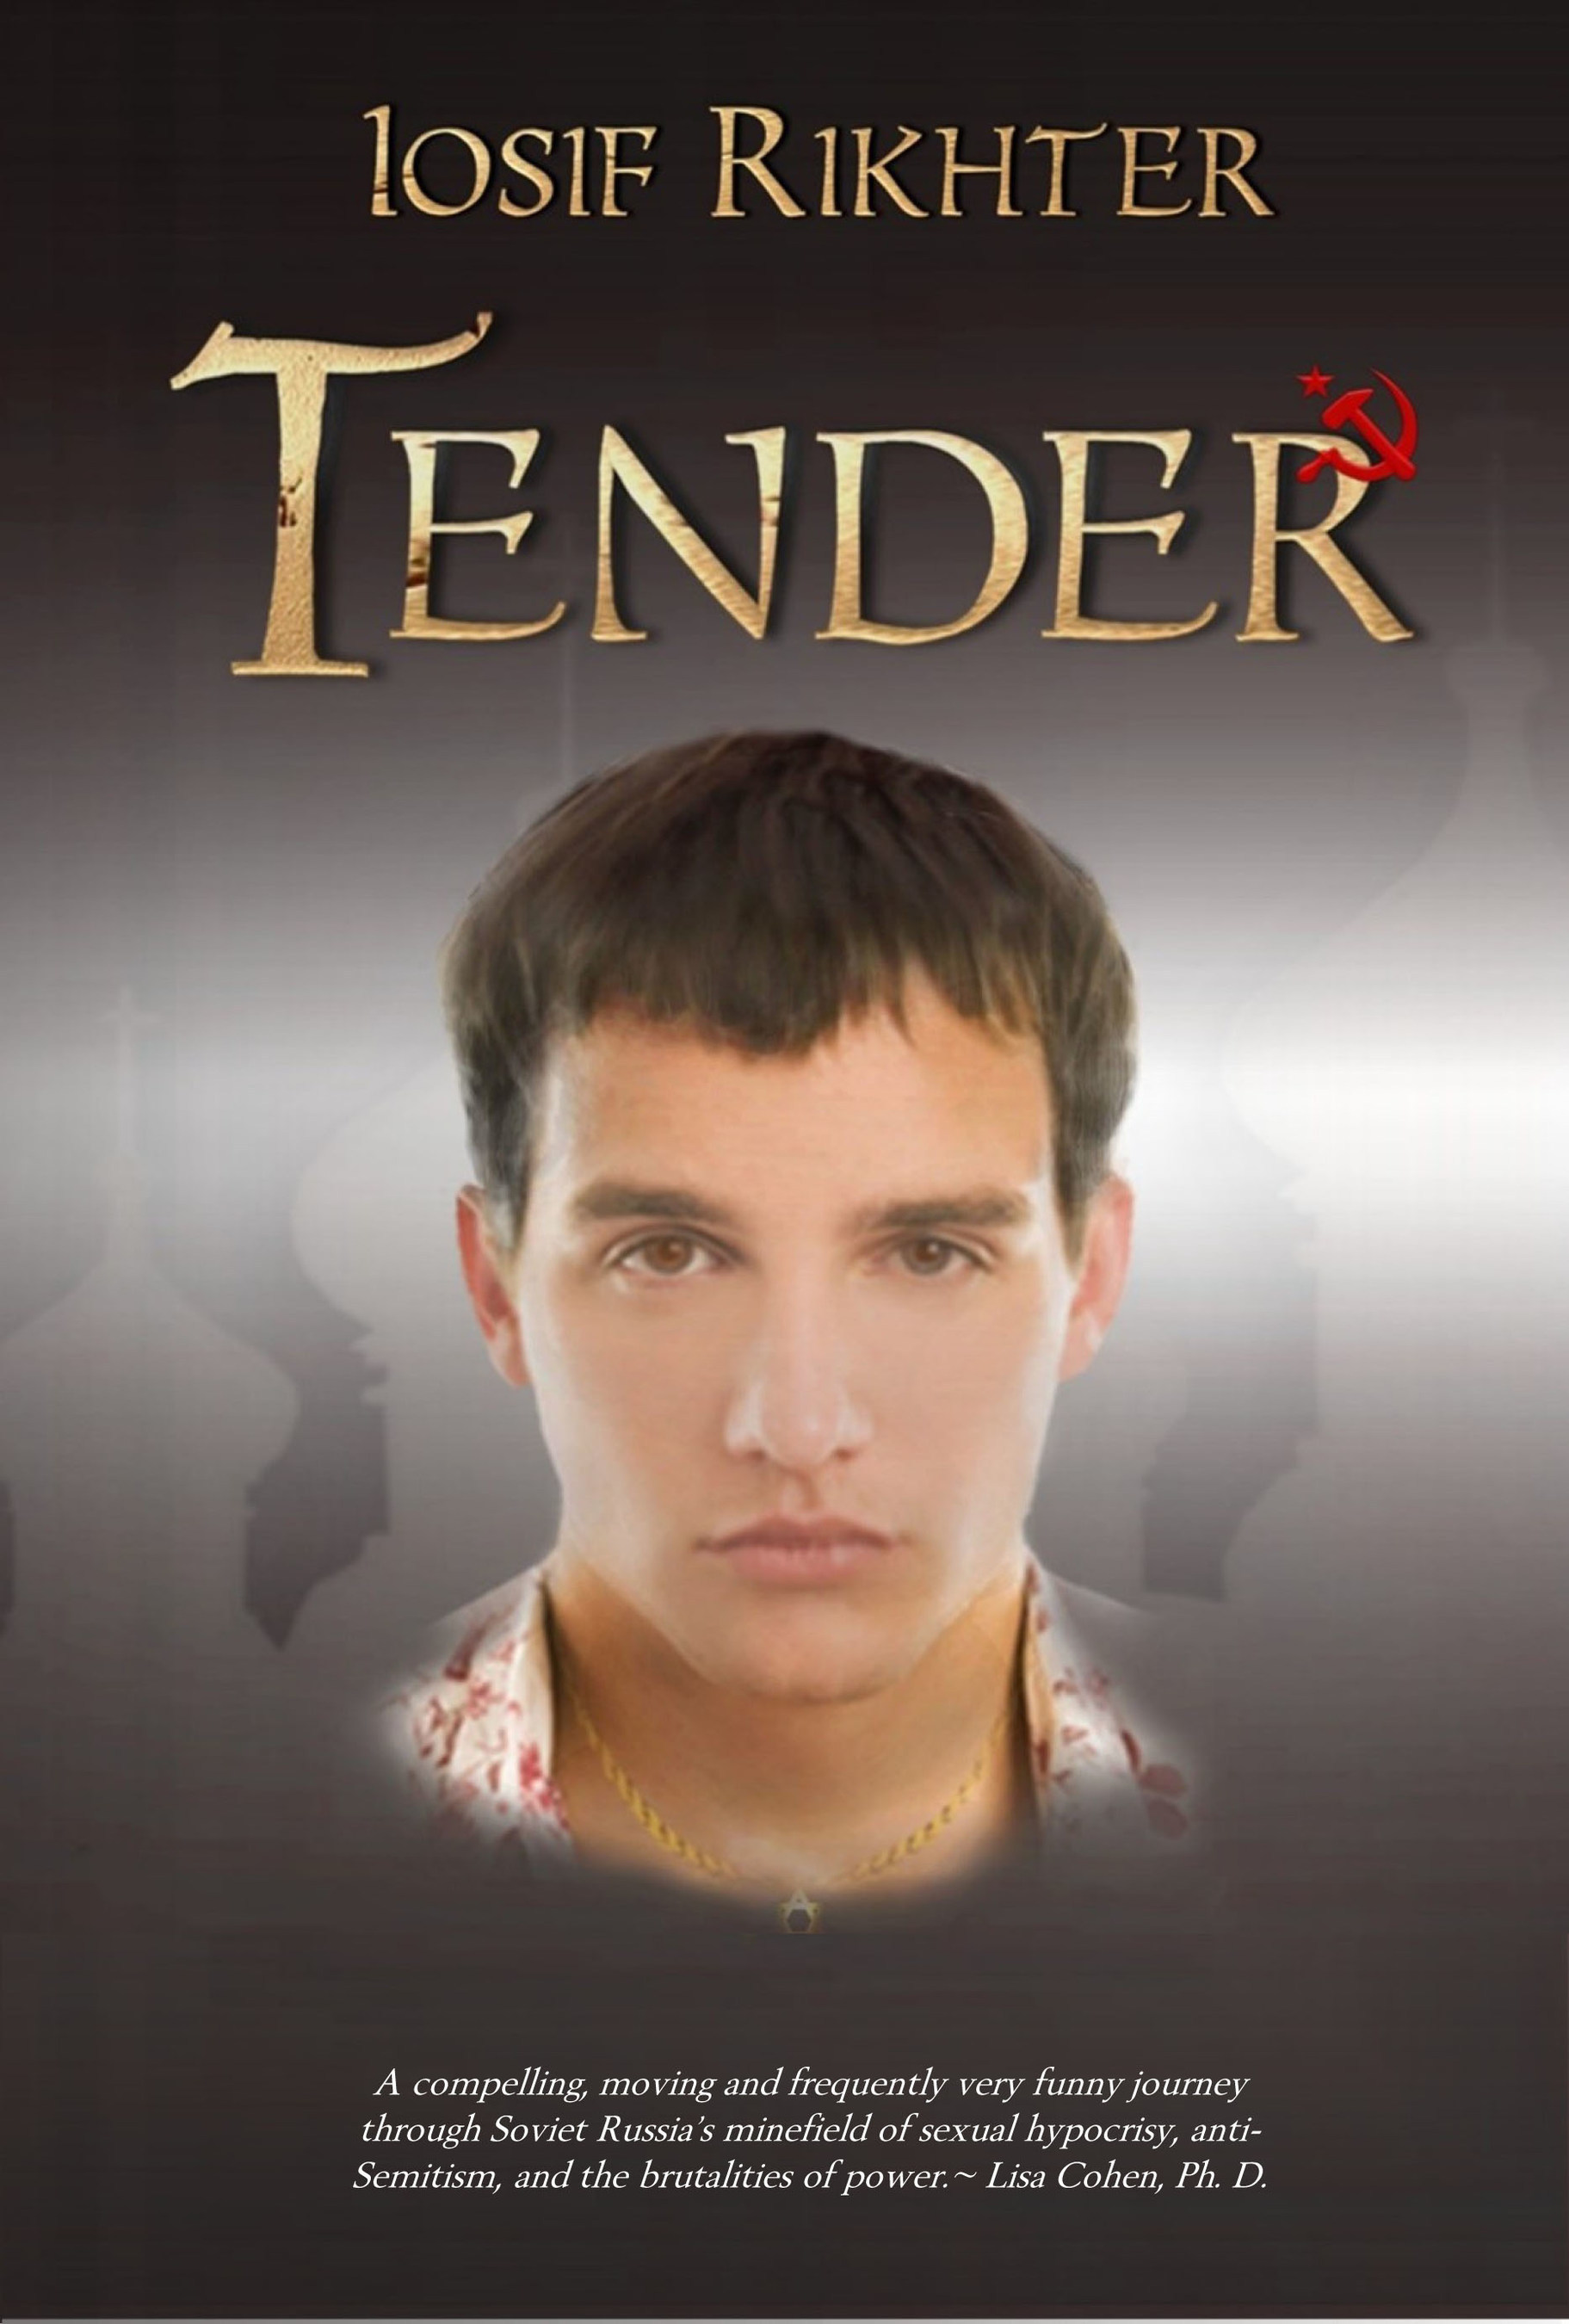 TENDER by Iosif Rikhter cover (PRNewsFoto/Iosif Rikhter)